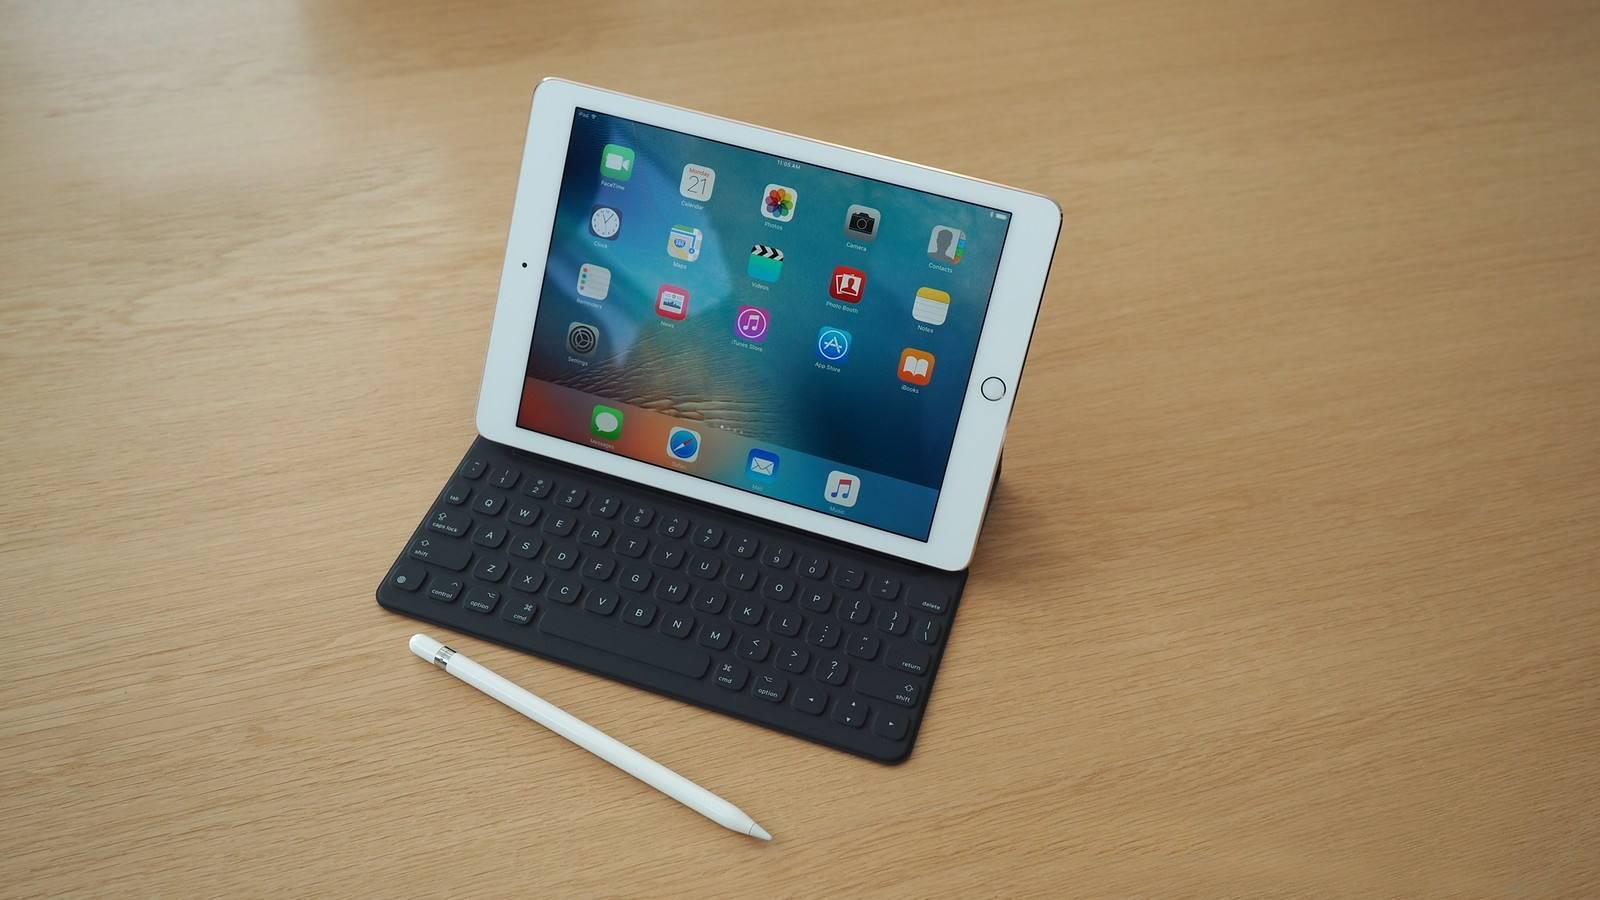 IPAD 平板电脑模型 苹果平板电脑模型-黑色 14